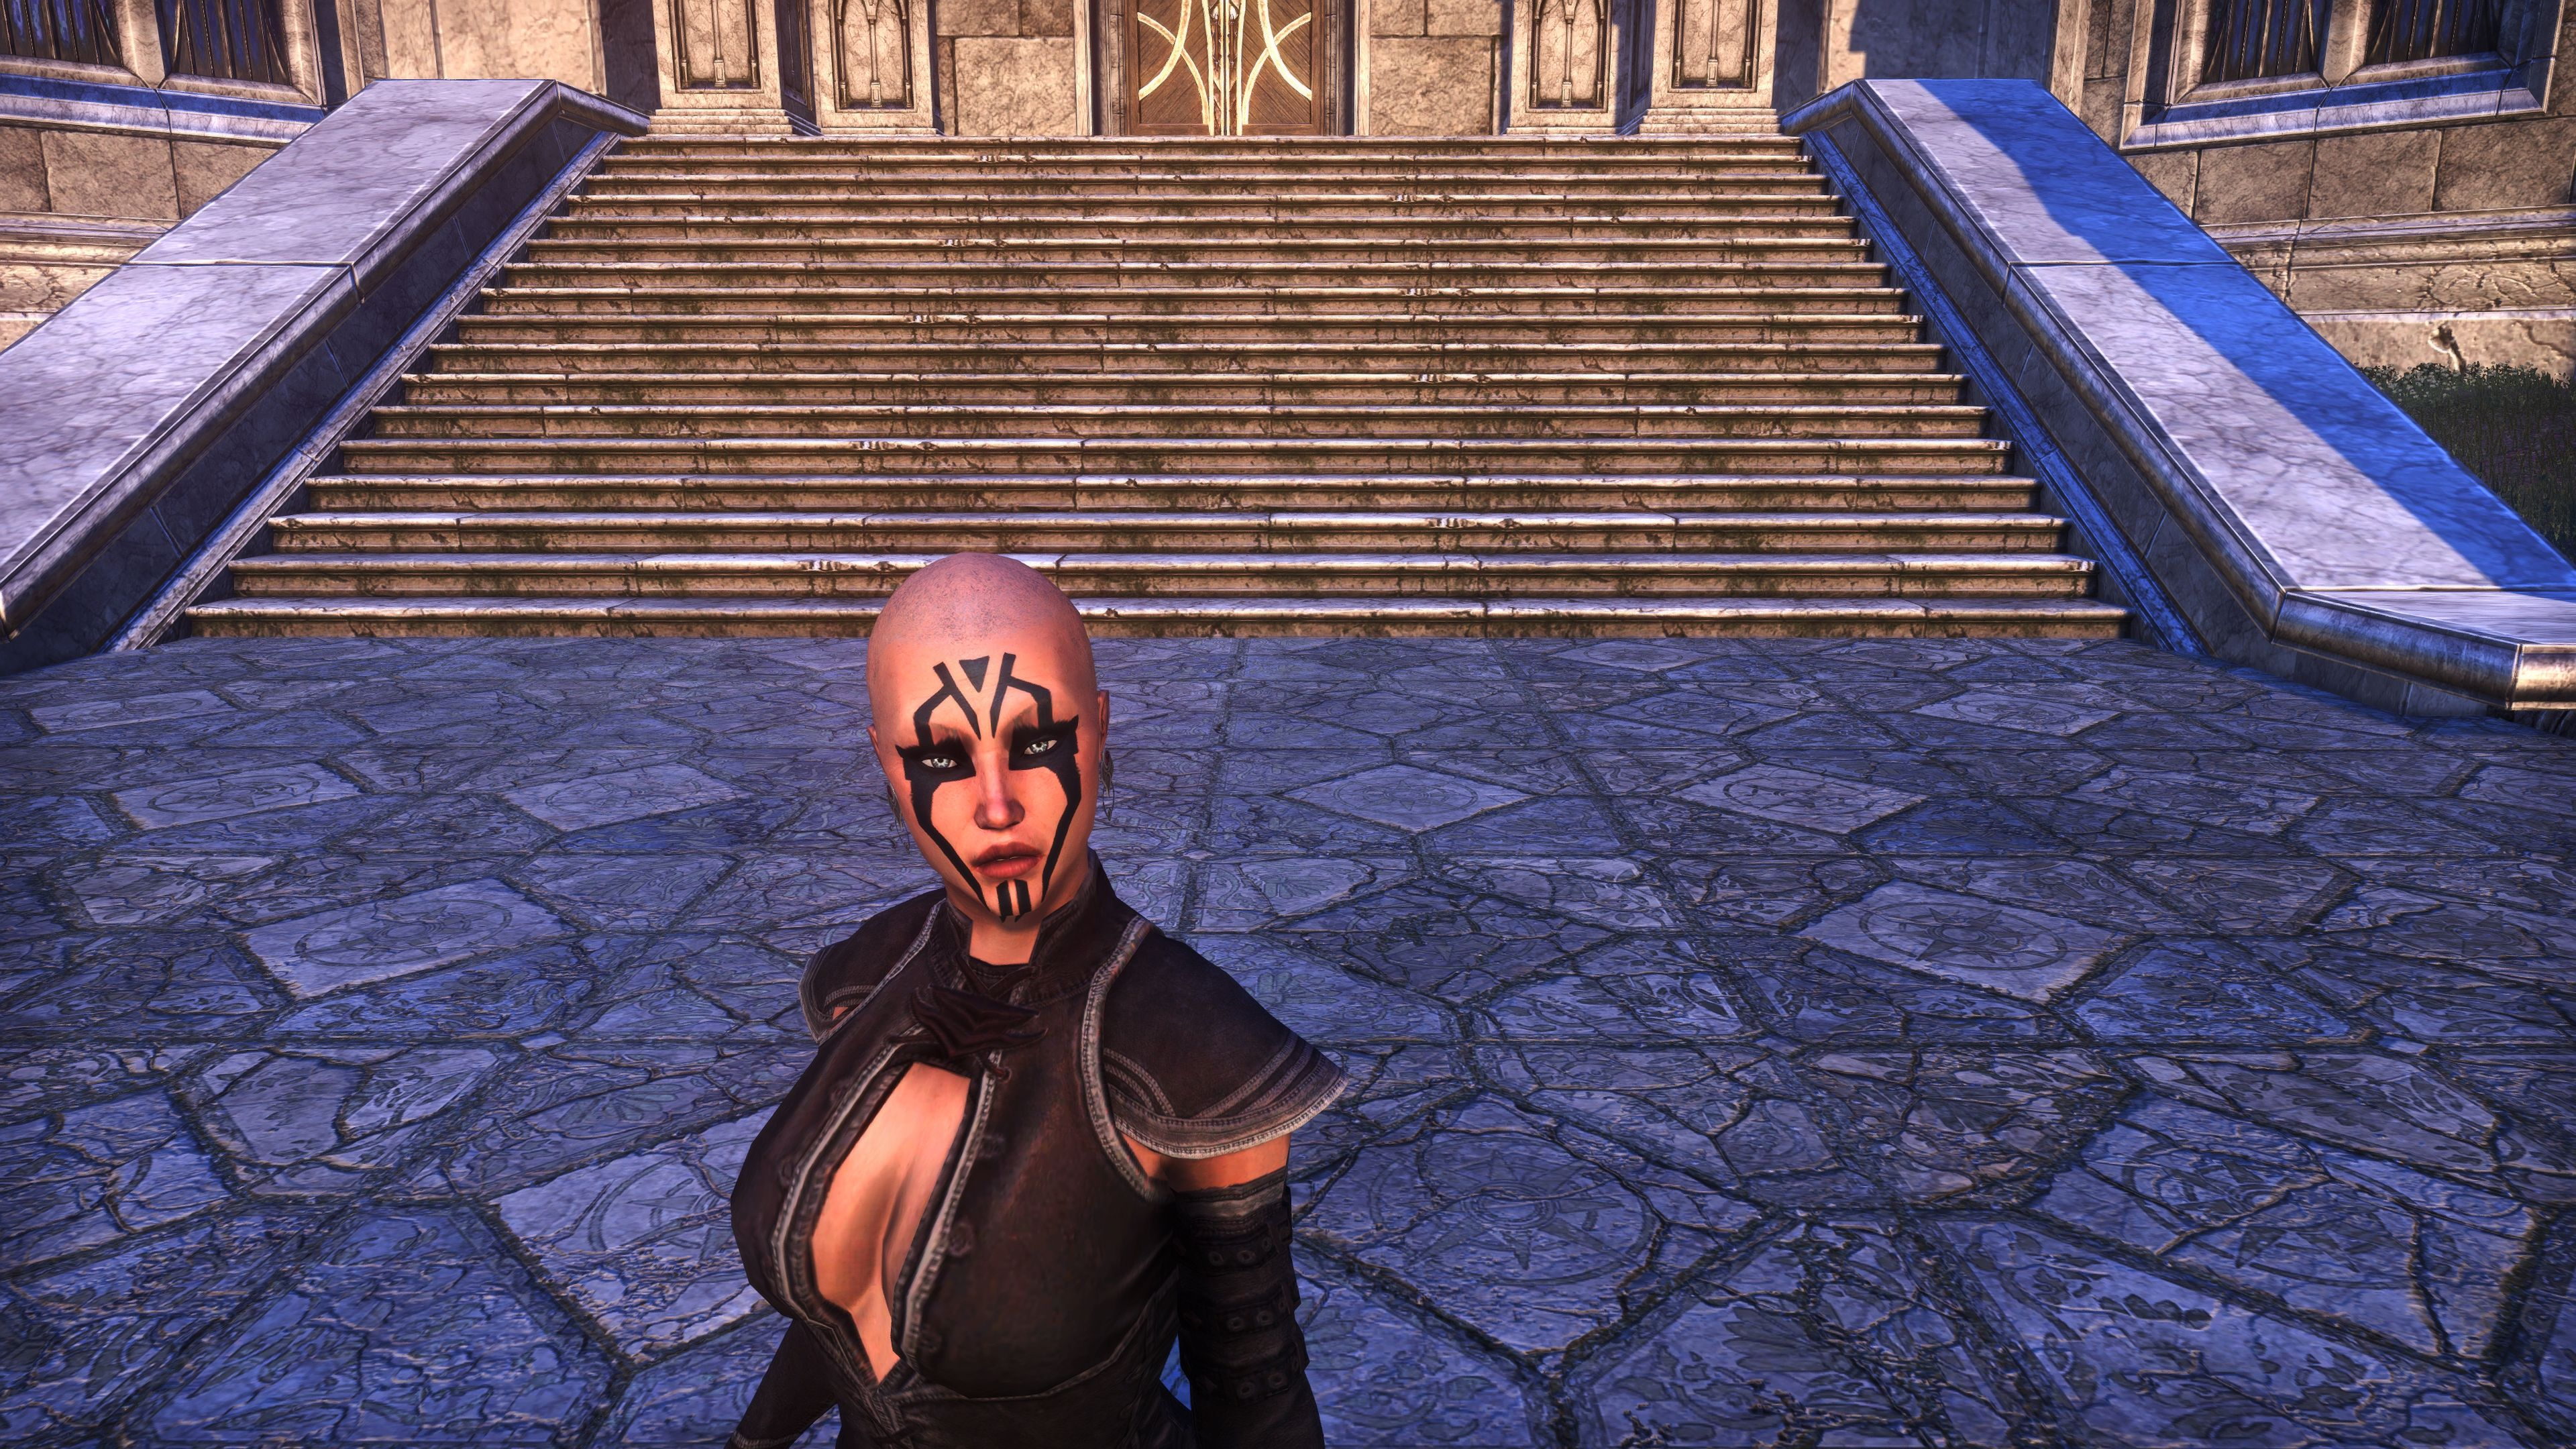 Dwarven Centurion Face Tattoos (Appearance > Face Markings), Psijic Vault Crate, The Elder Scrolls Online